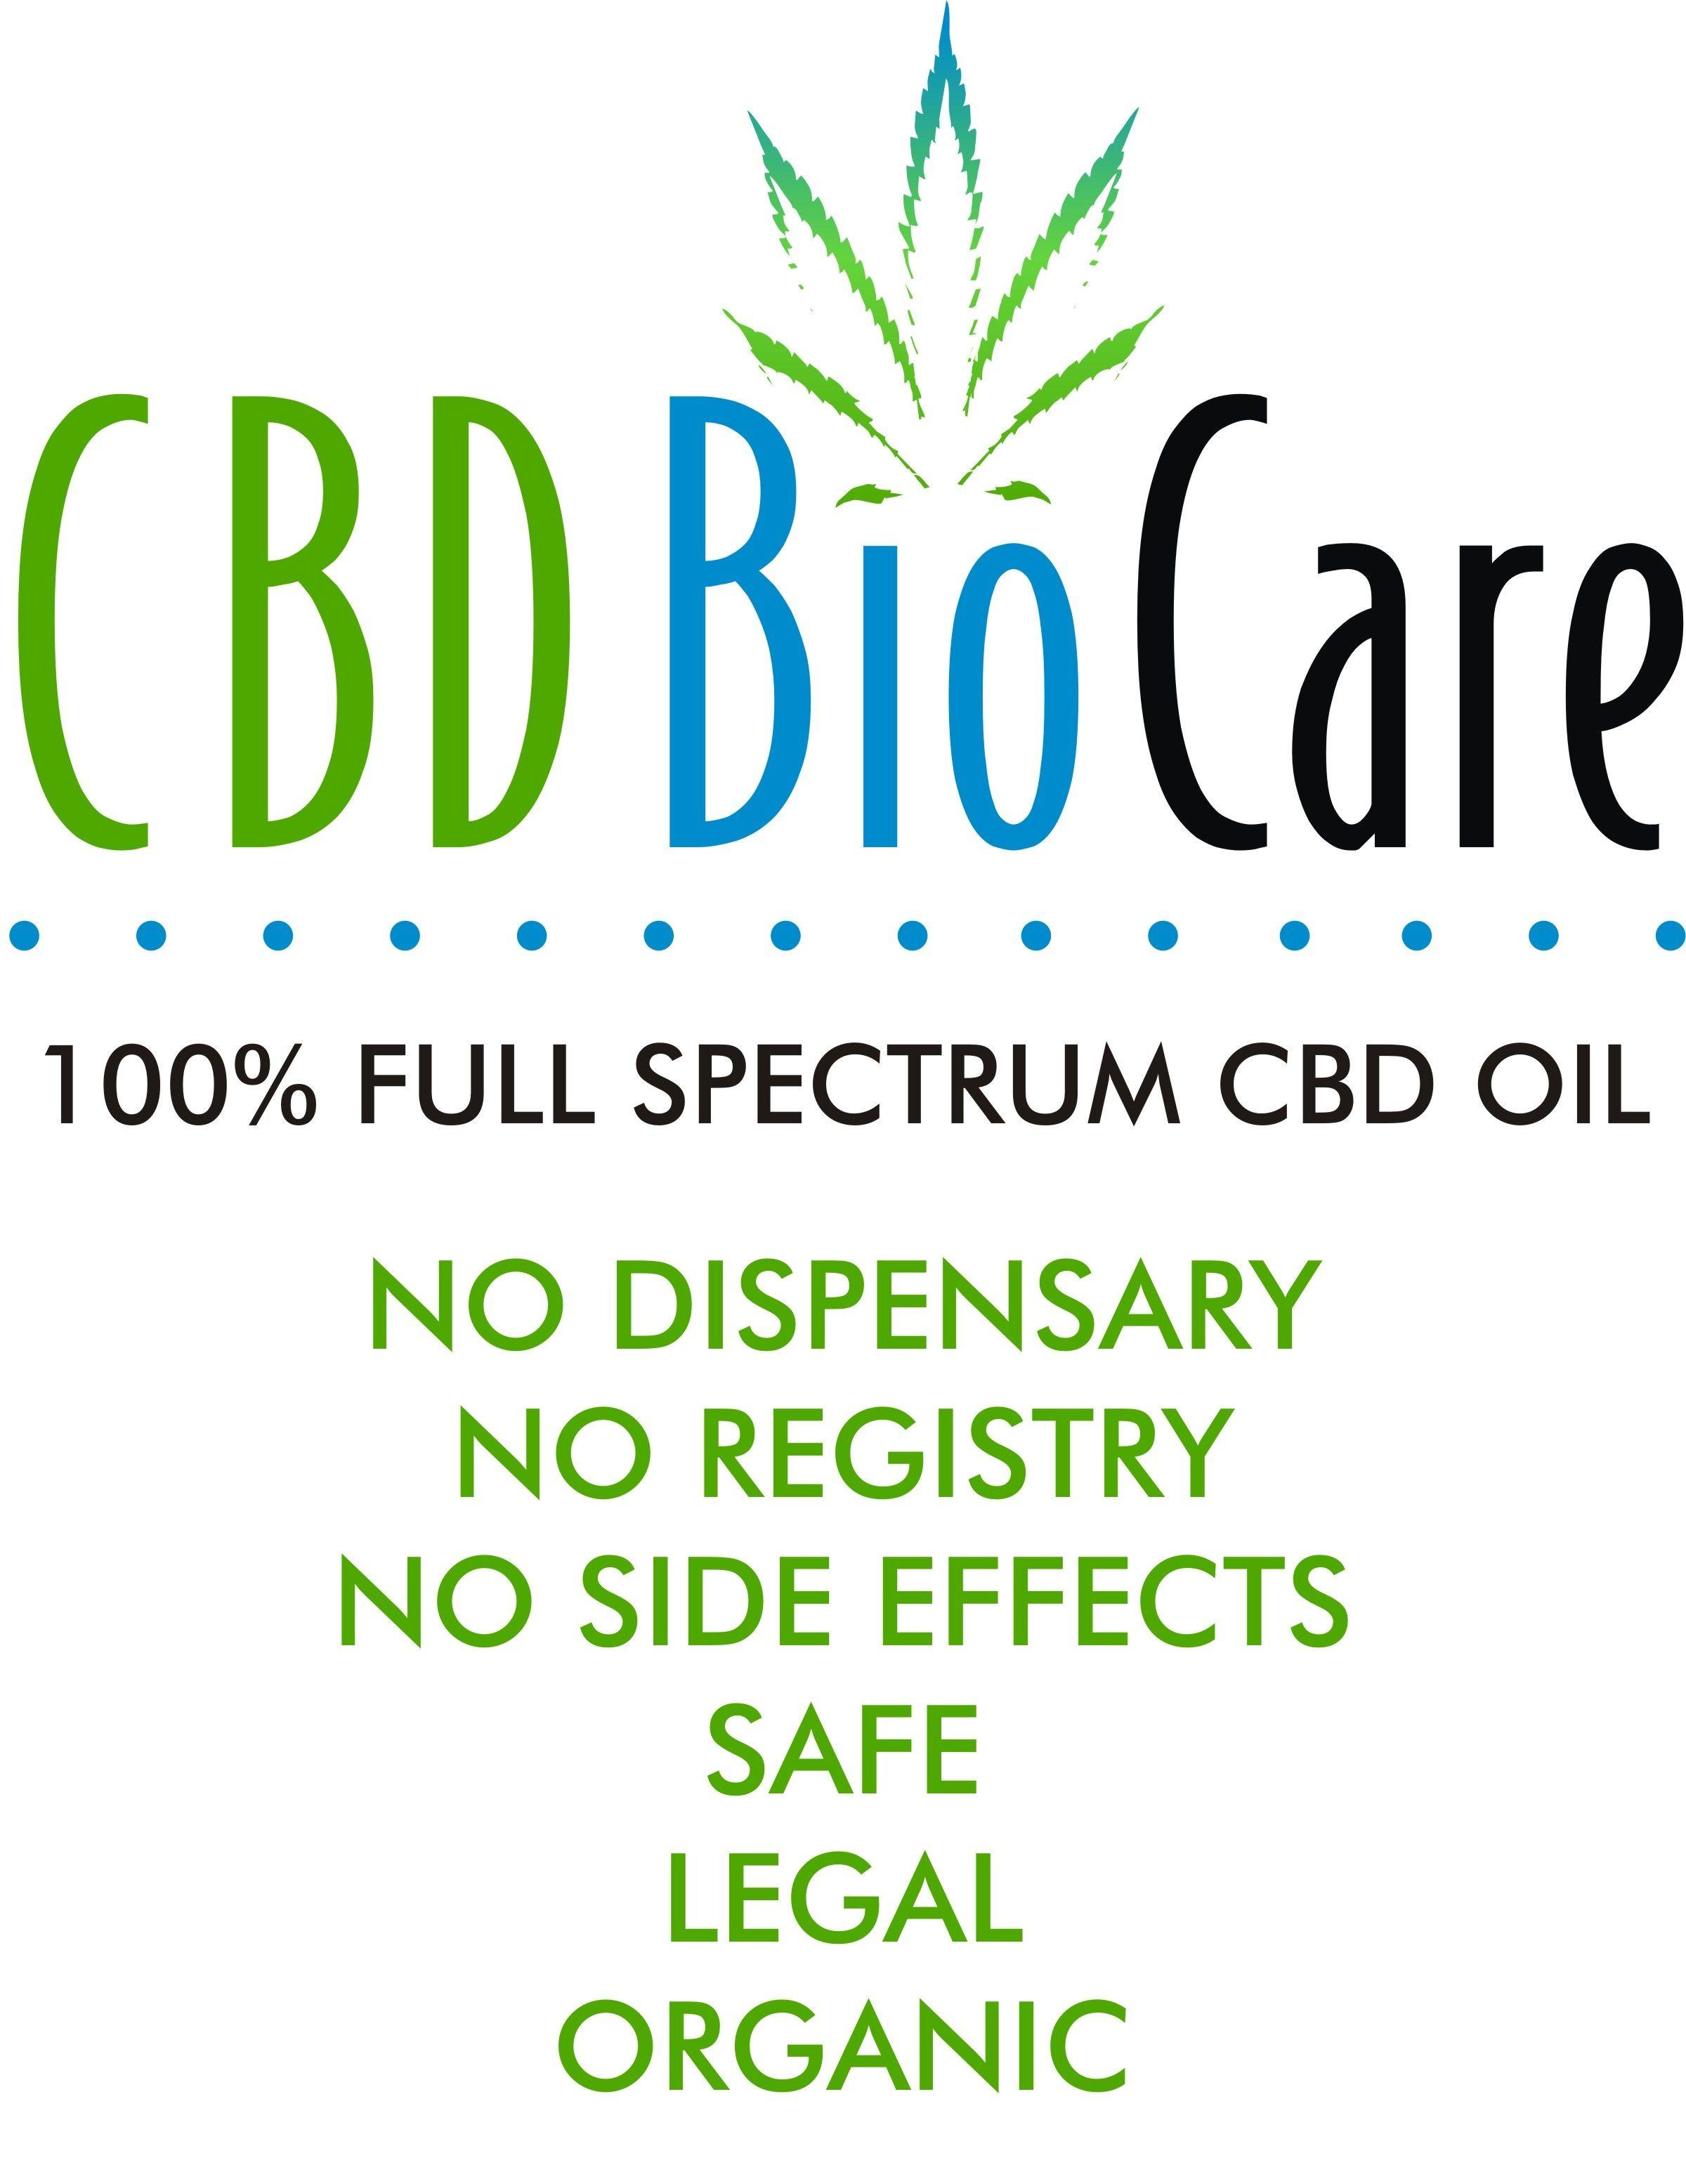 CBD Buyers Club offering CBD BioCare products | CBD Oil